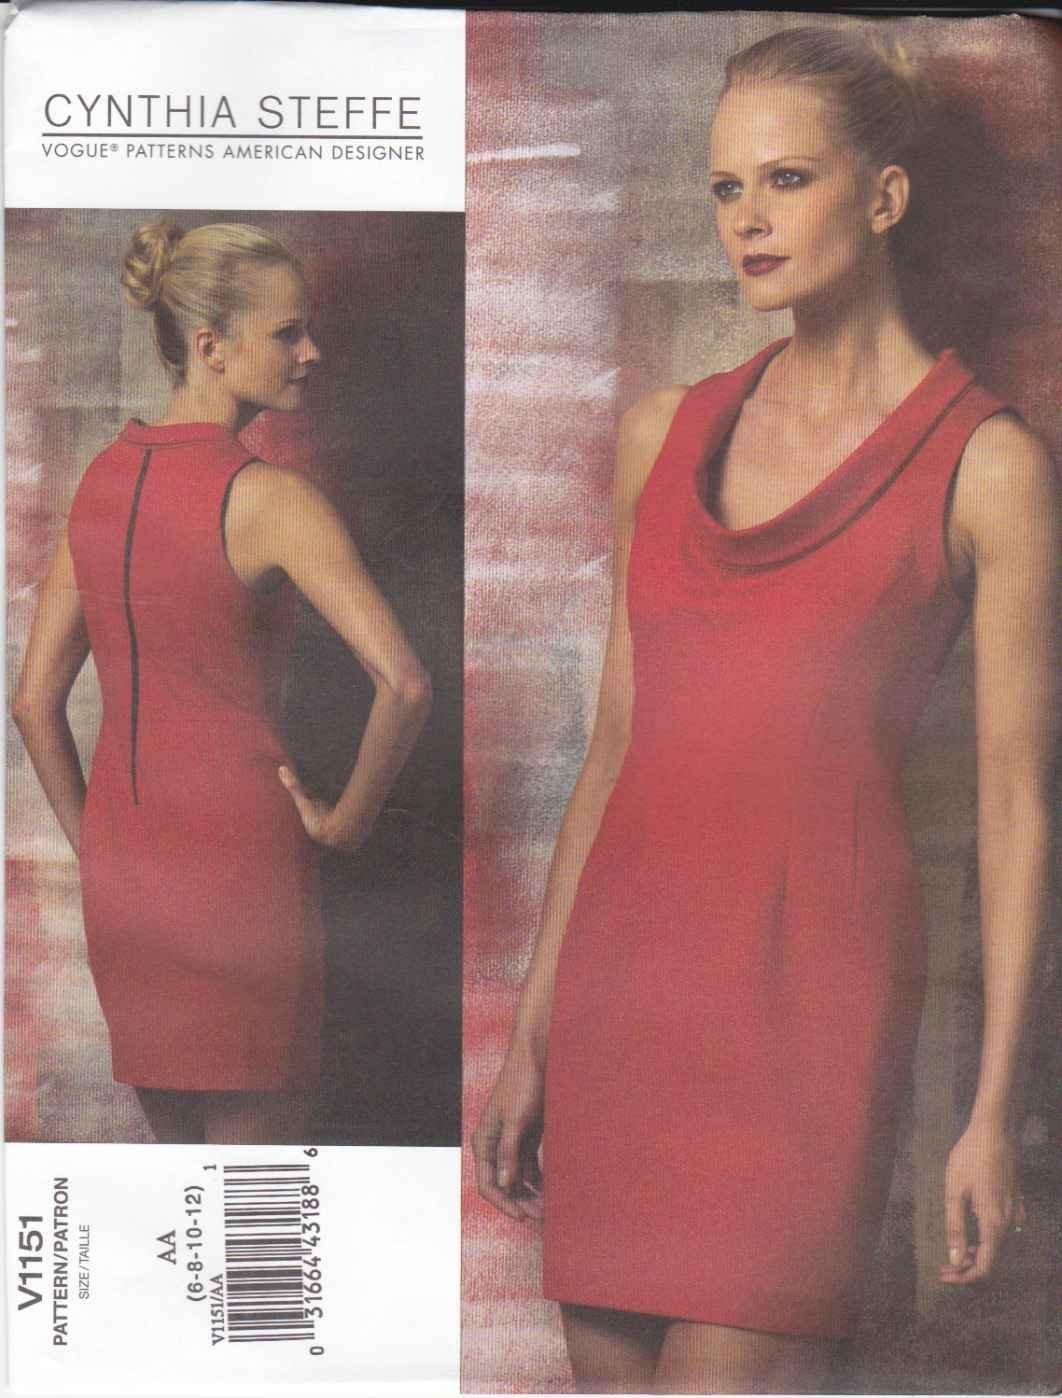 Vogue Sewing Pattern 1151 Misess Sizes 14-20 Cynthia Steffe Easy Straight Sleeveless Knit Dress